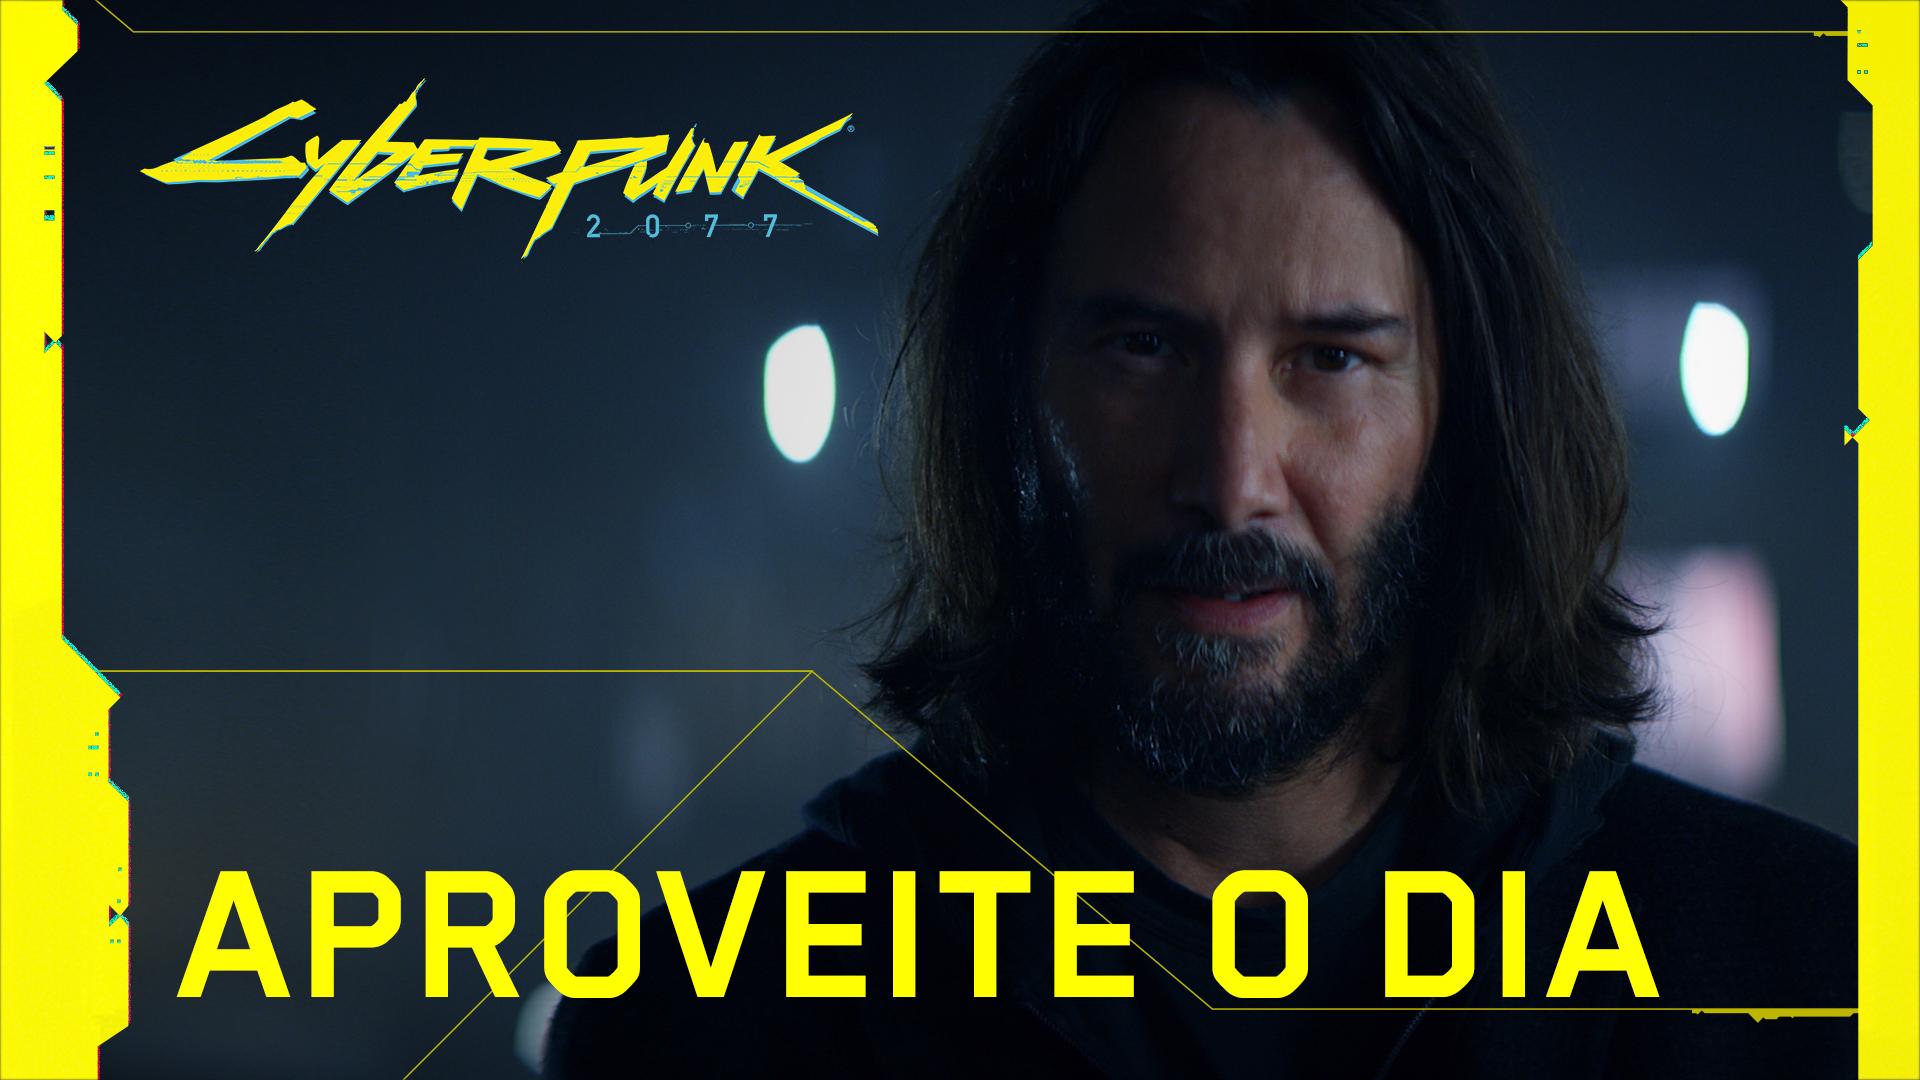 CD Projekt Red   Keanu Reeves estrela novo comercial de Cyberpunk 2077